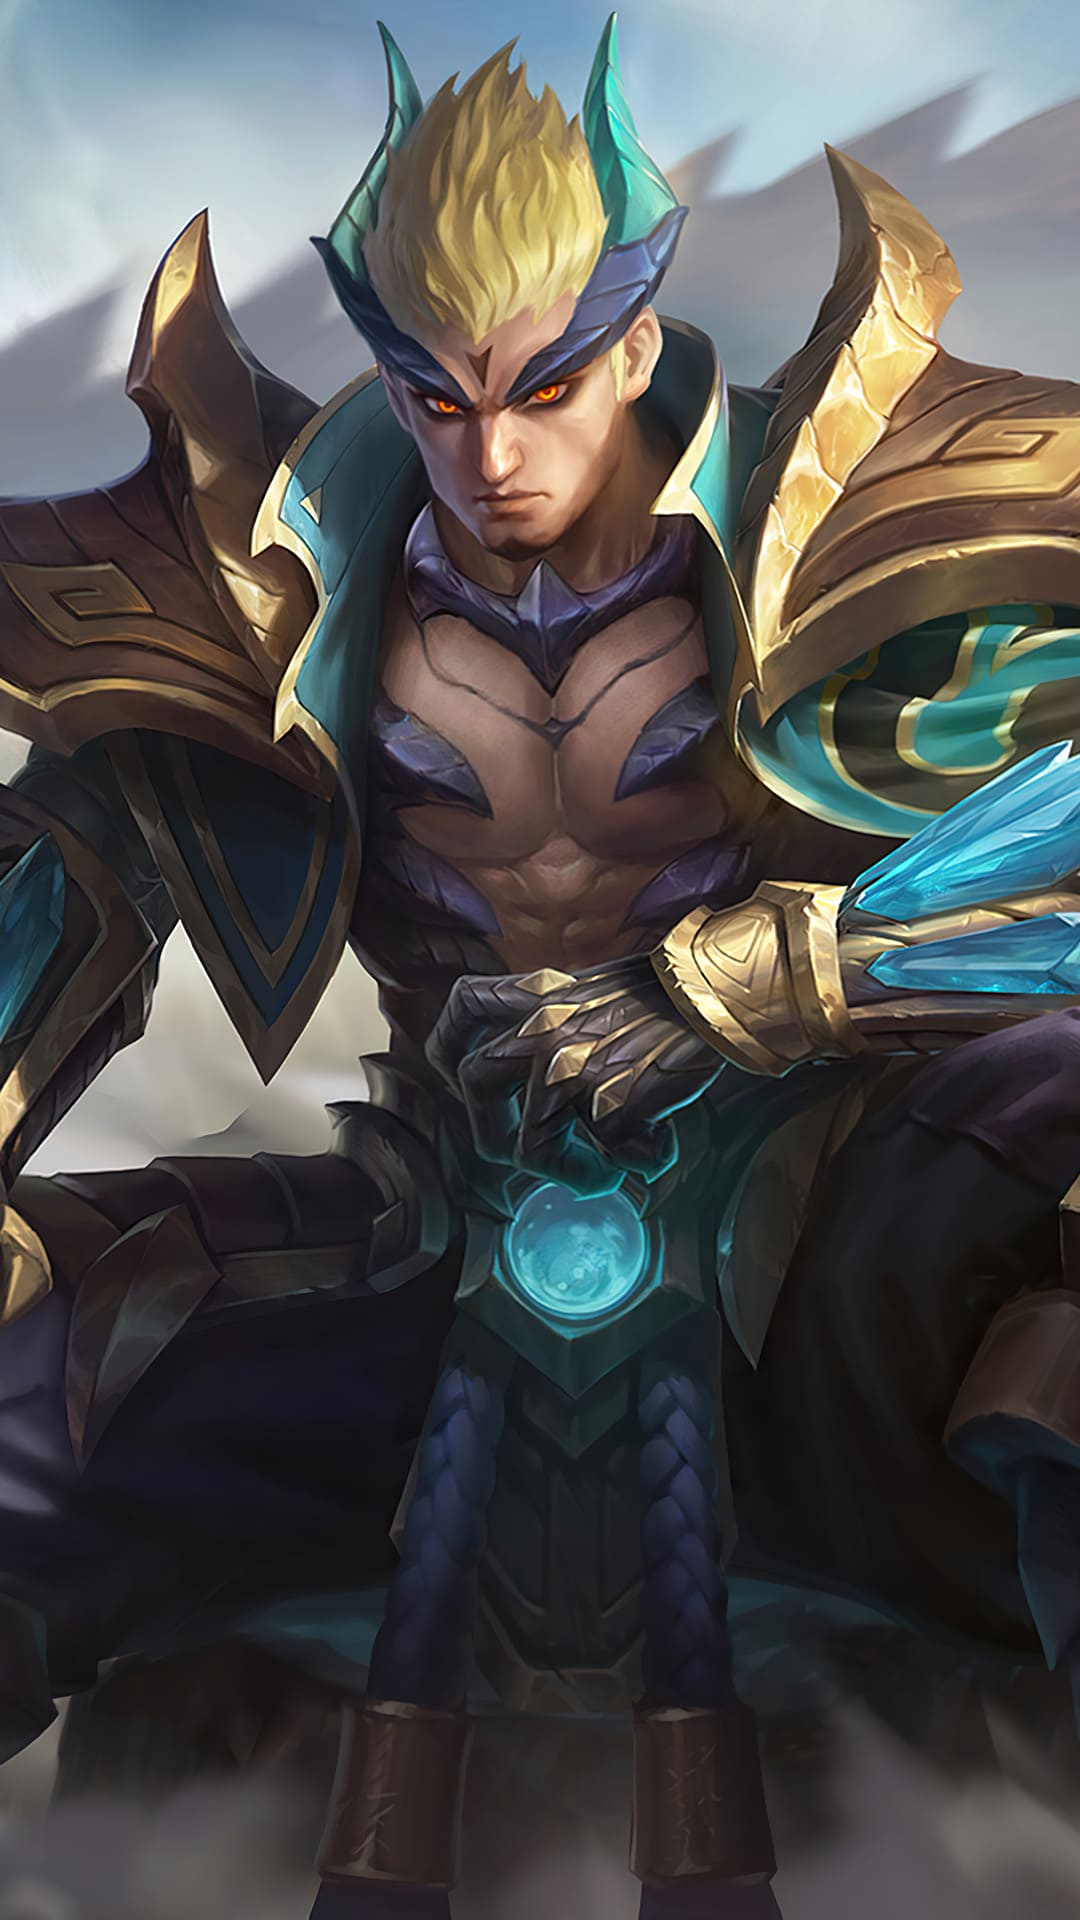 Wallpaper yu zhong emerald dragon skin mobile legends for mobile hobigame